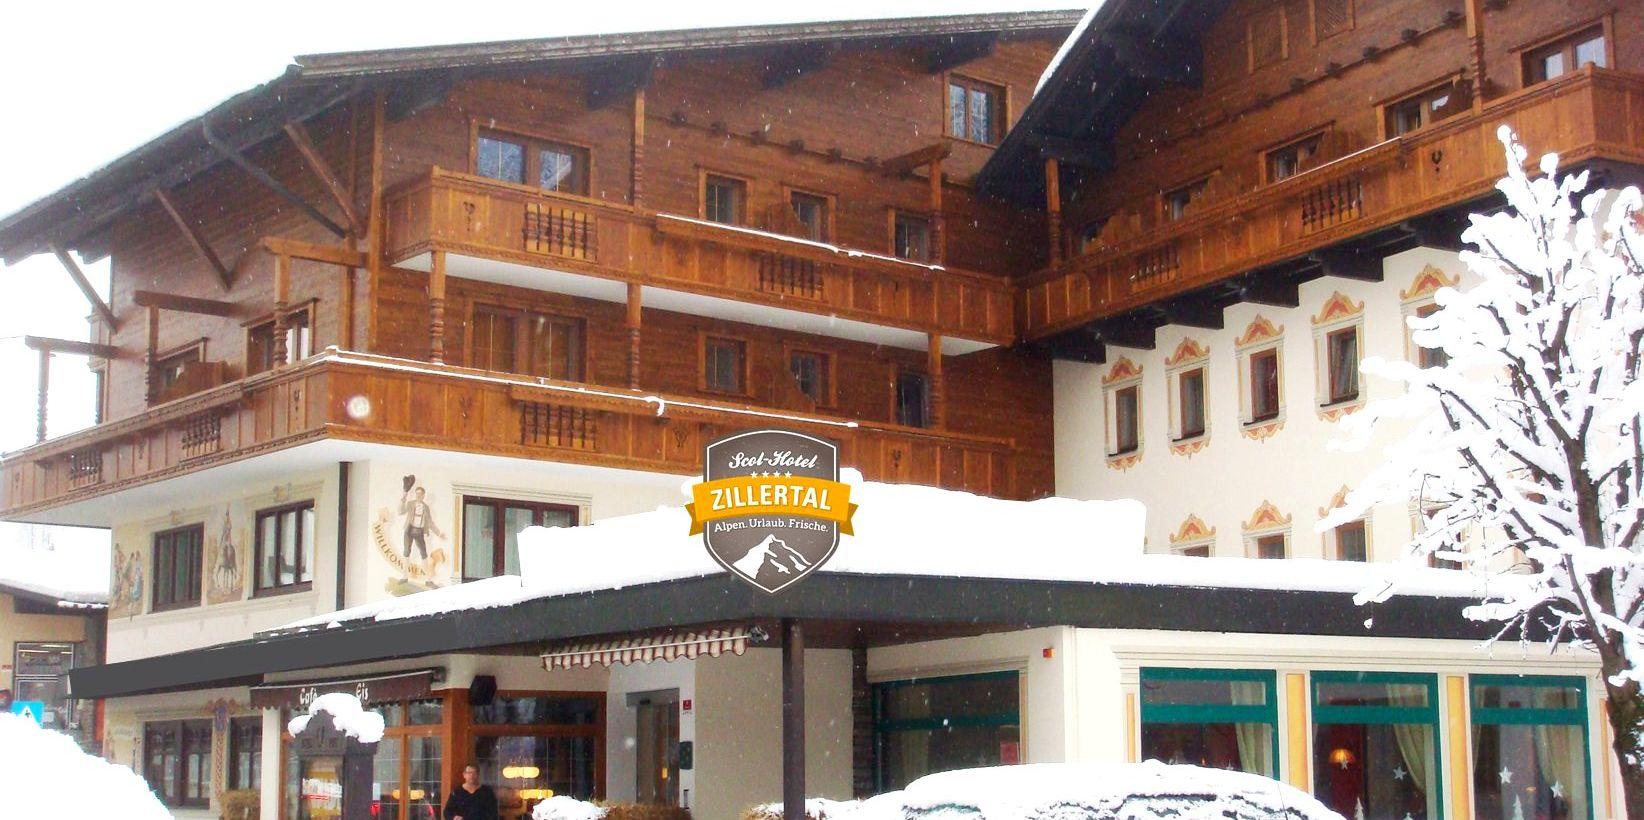 Slide1 - SCOL Sporthotel Zillertal